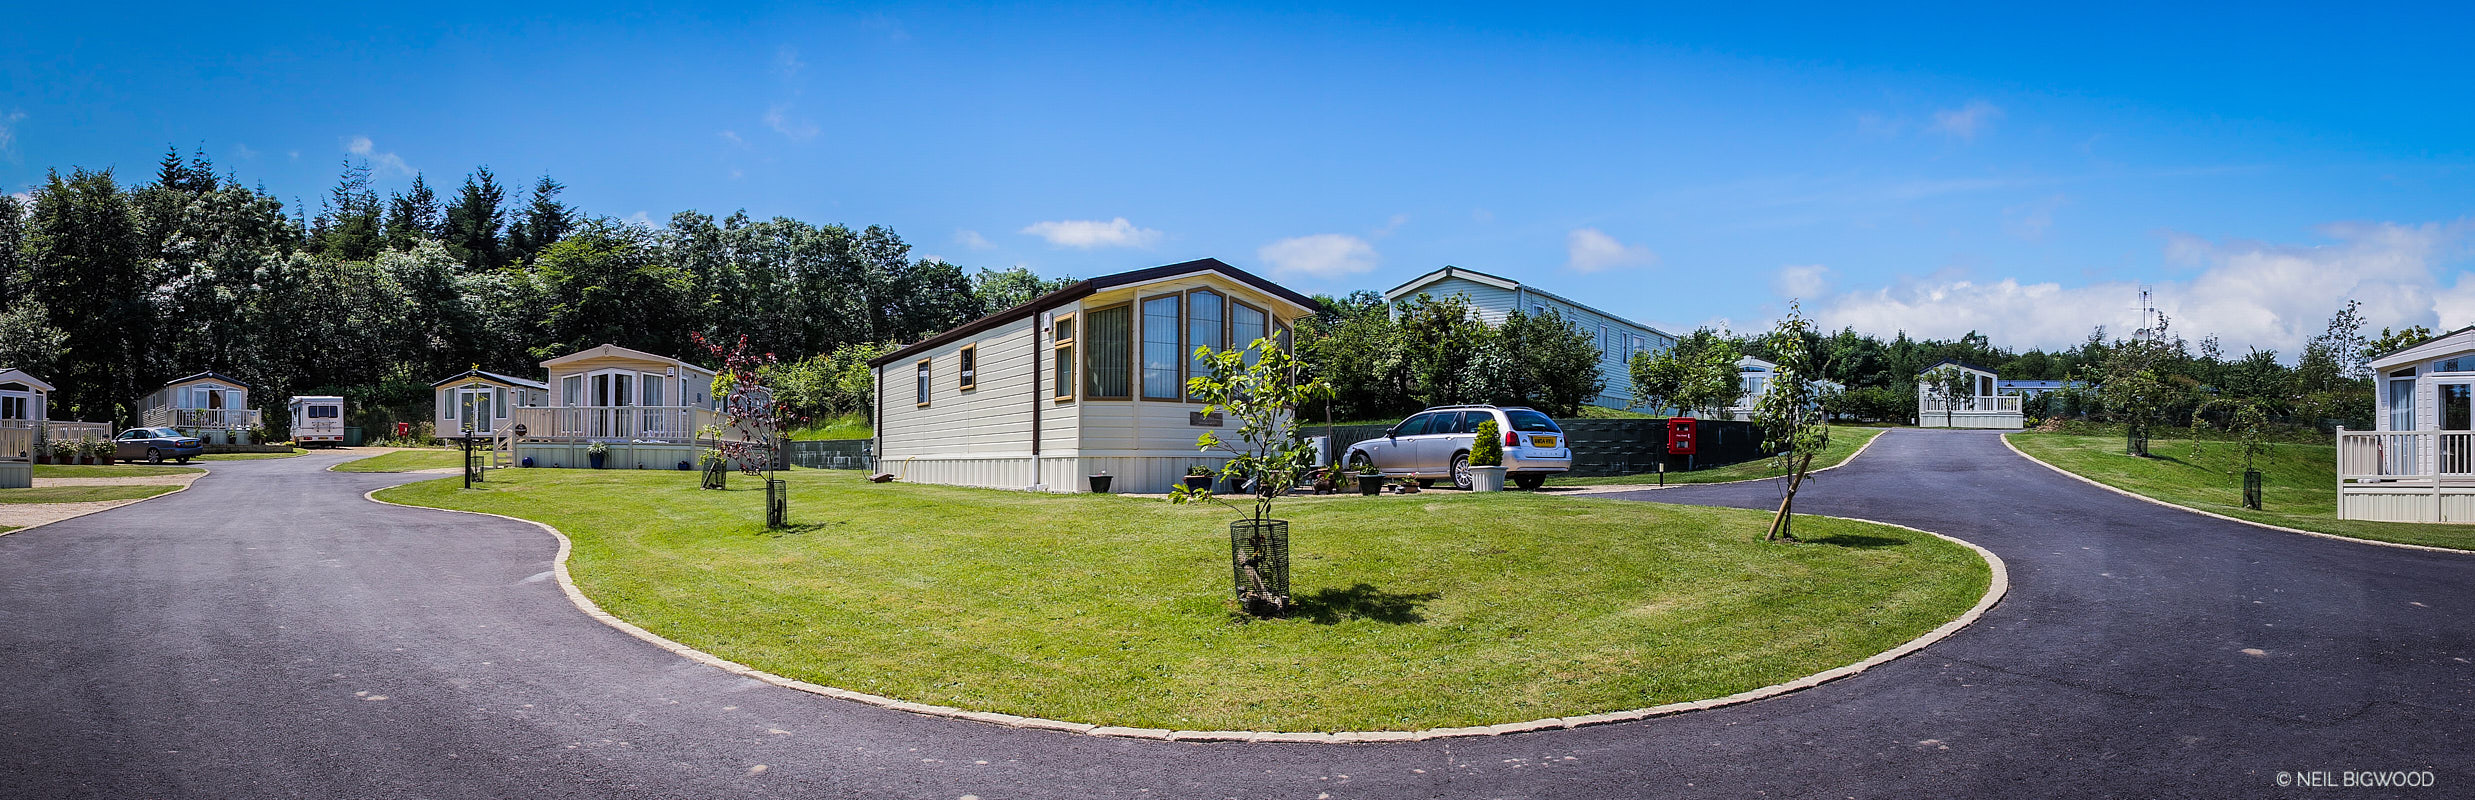 Neil-Bigwood-Monkton-Wyld-Holiday-Homes-70